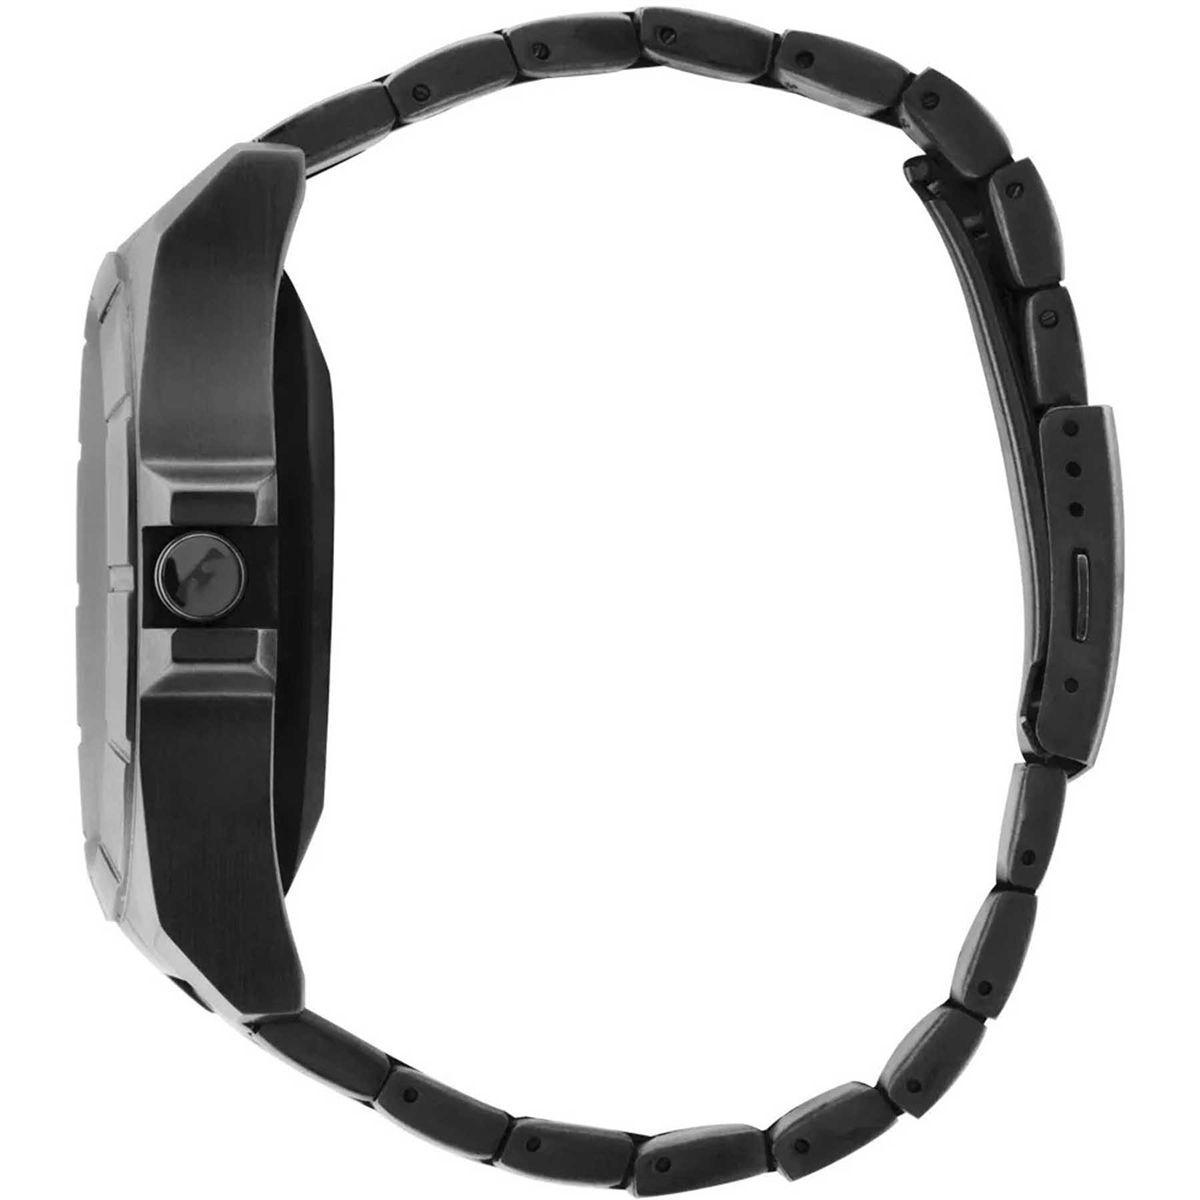 e94284e845b68 Relógio Technos Skydriver Masculino Smartwatch Troca Pulseira SRAC 4P R   1.276